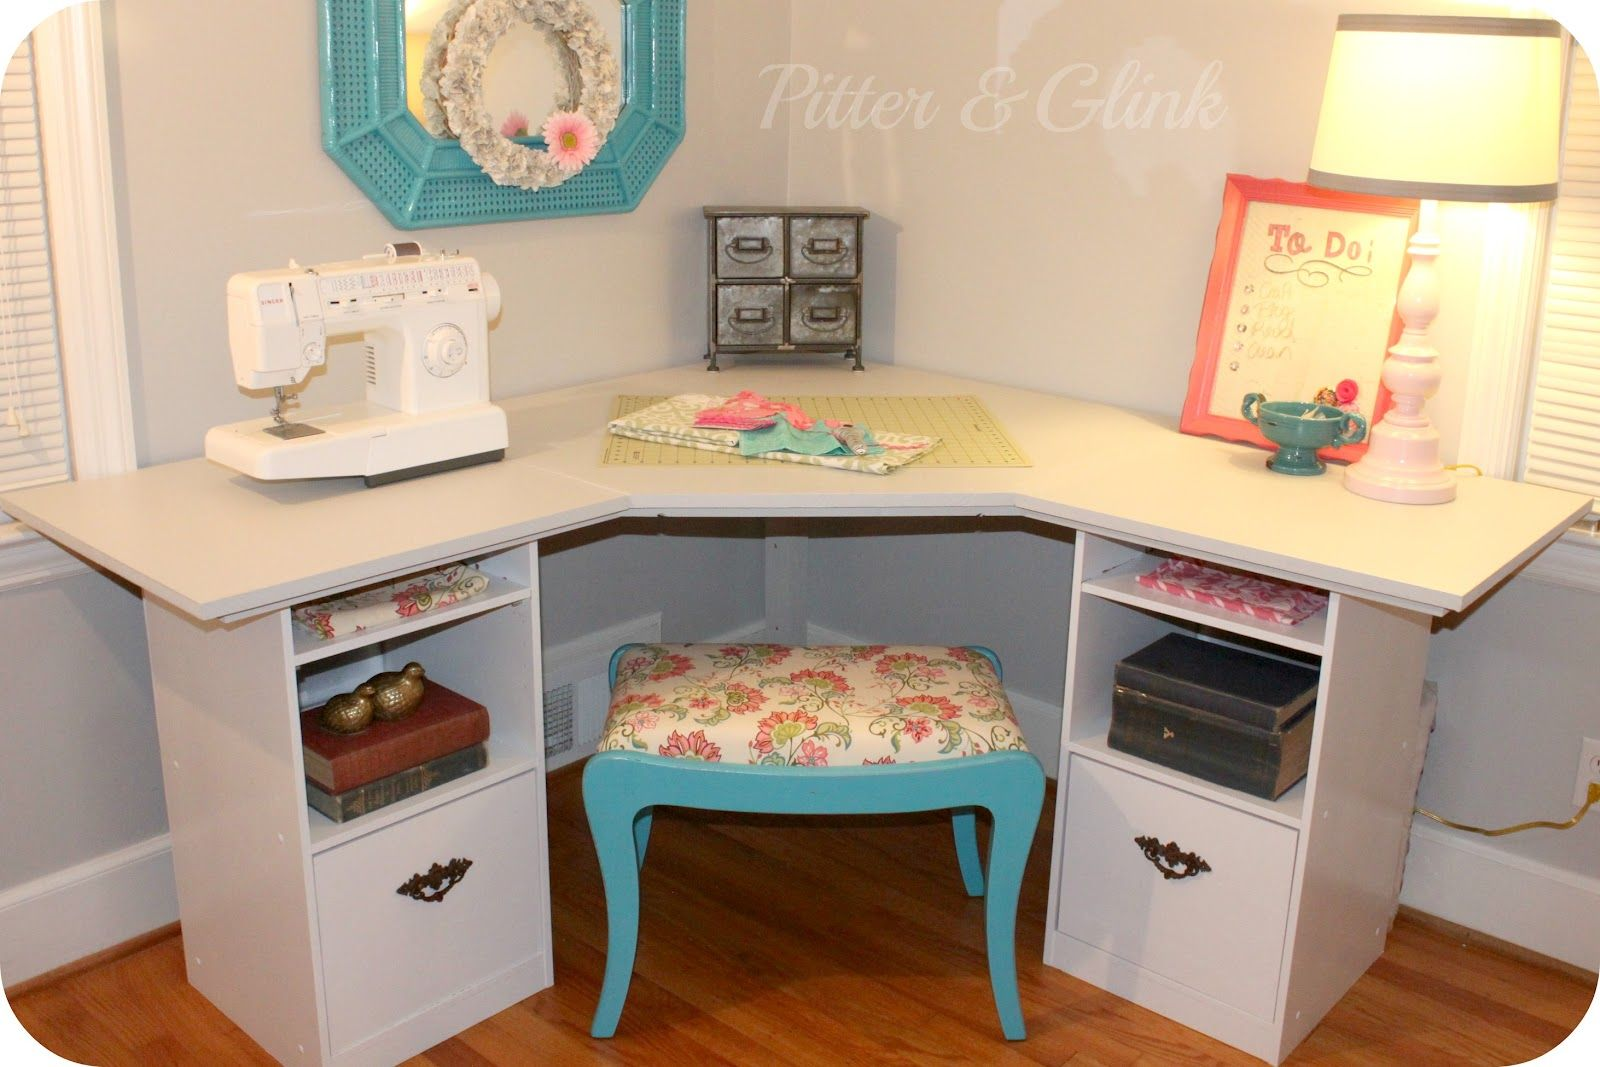 Pitterandglink craft room corner desk diy tutorial for Kids craft room